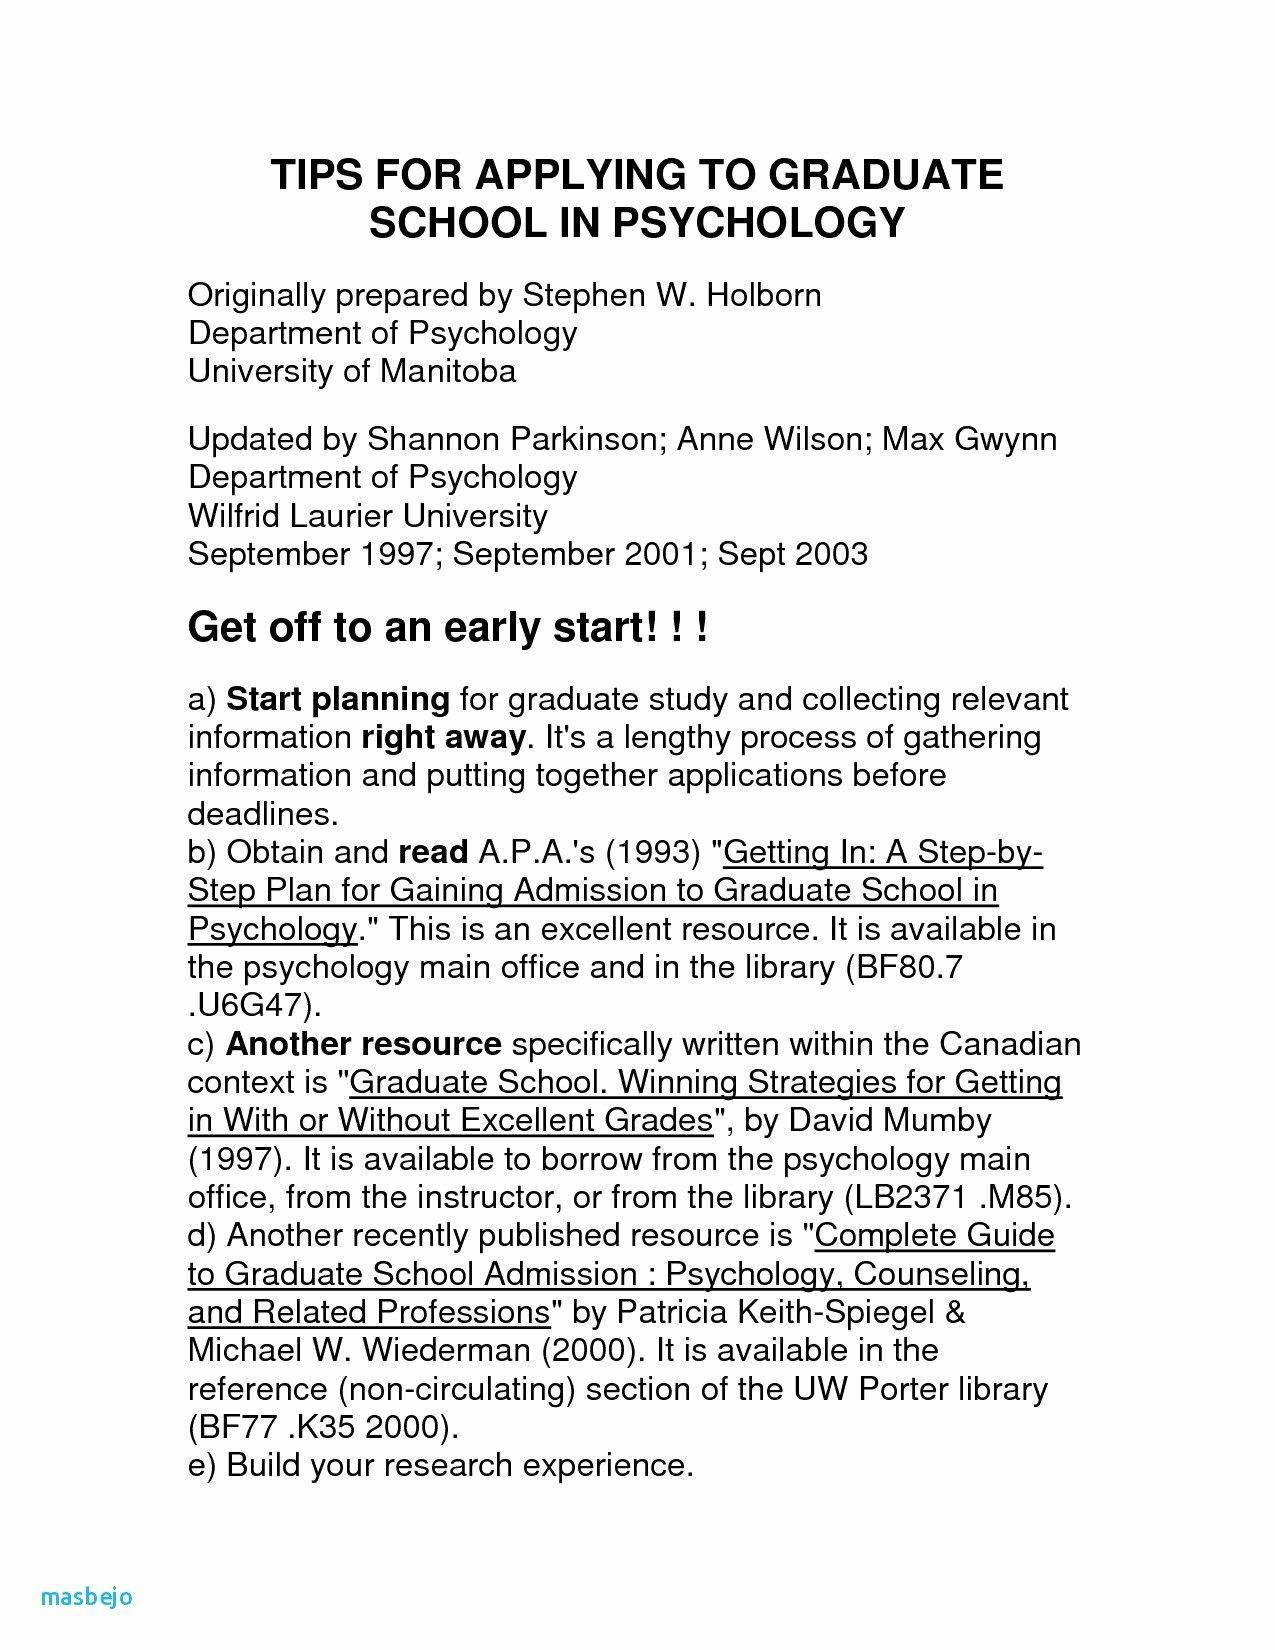 Psychology Degree Resume Luxury Nice Psychology Resume Template S Academic Resum Resume For Graduate School Graduate School Psychology Degree